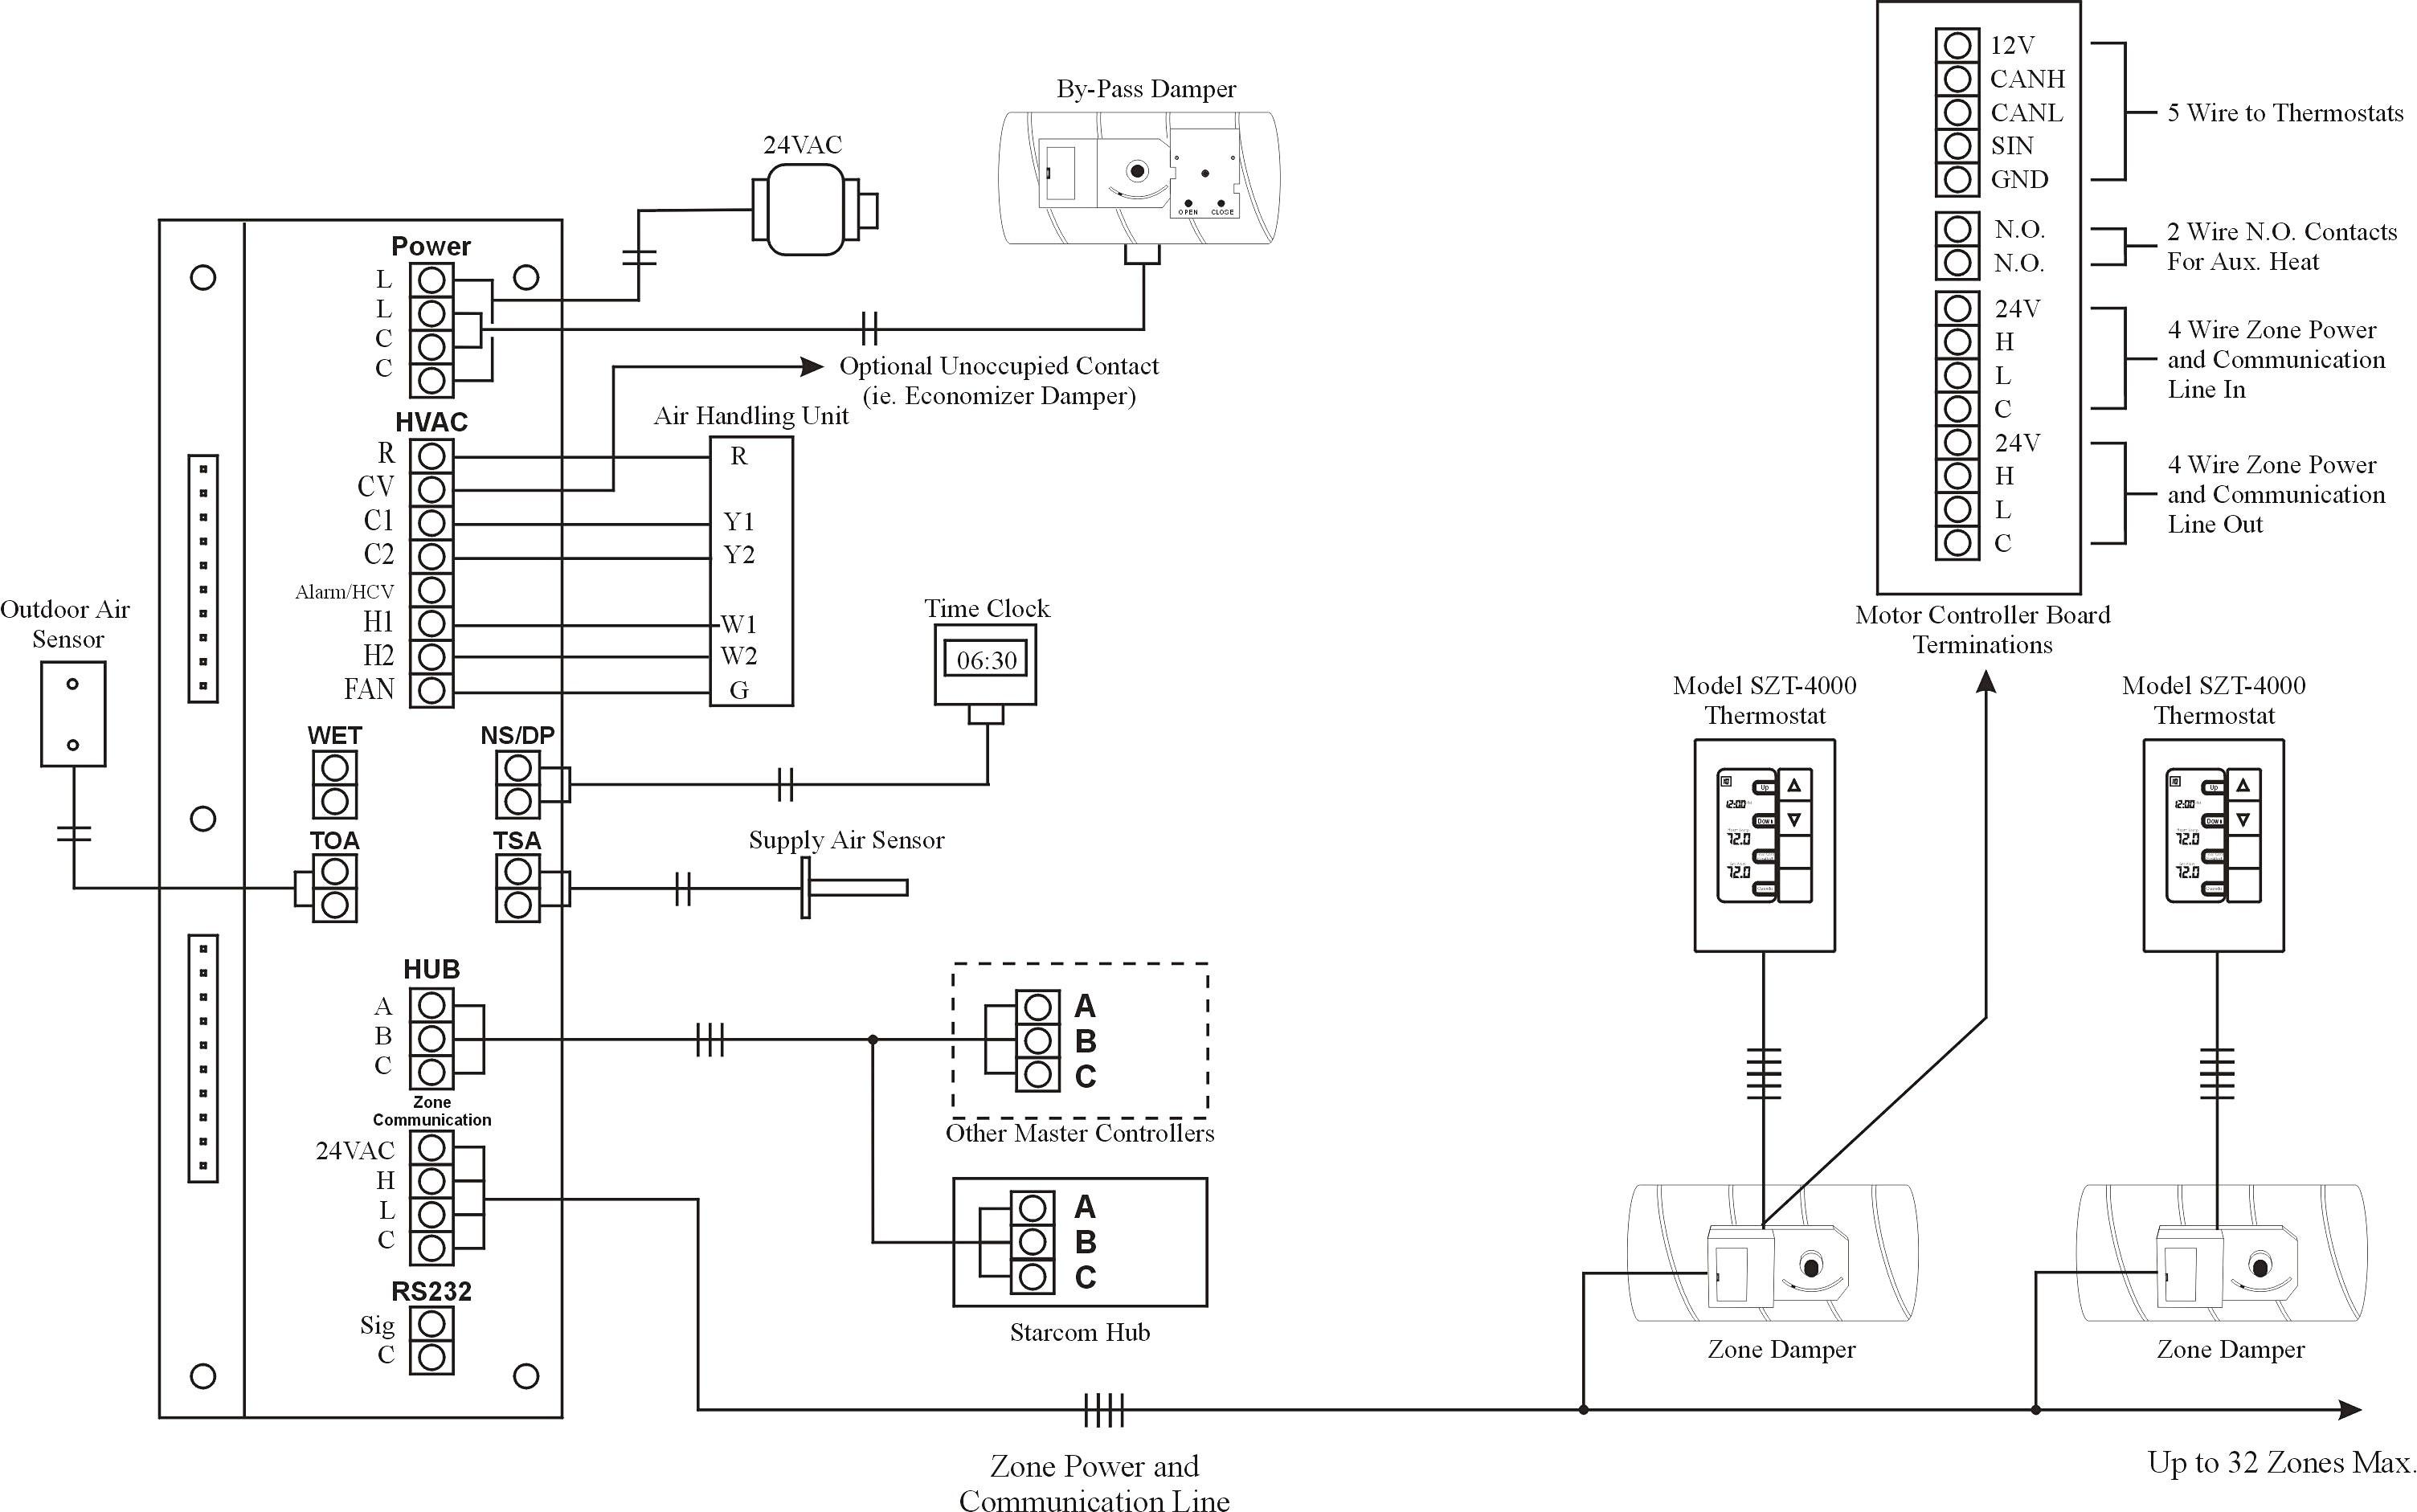 1978 Honda Xl 125 Wiring Diagram Honda Cb 900 Wiring Diagram Honda Wiring Diagrams Instructions Of 1978 Honda Xl 125 Wiring Diagram